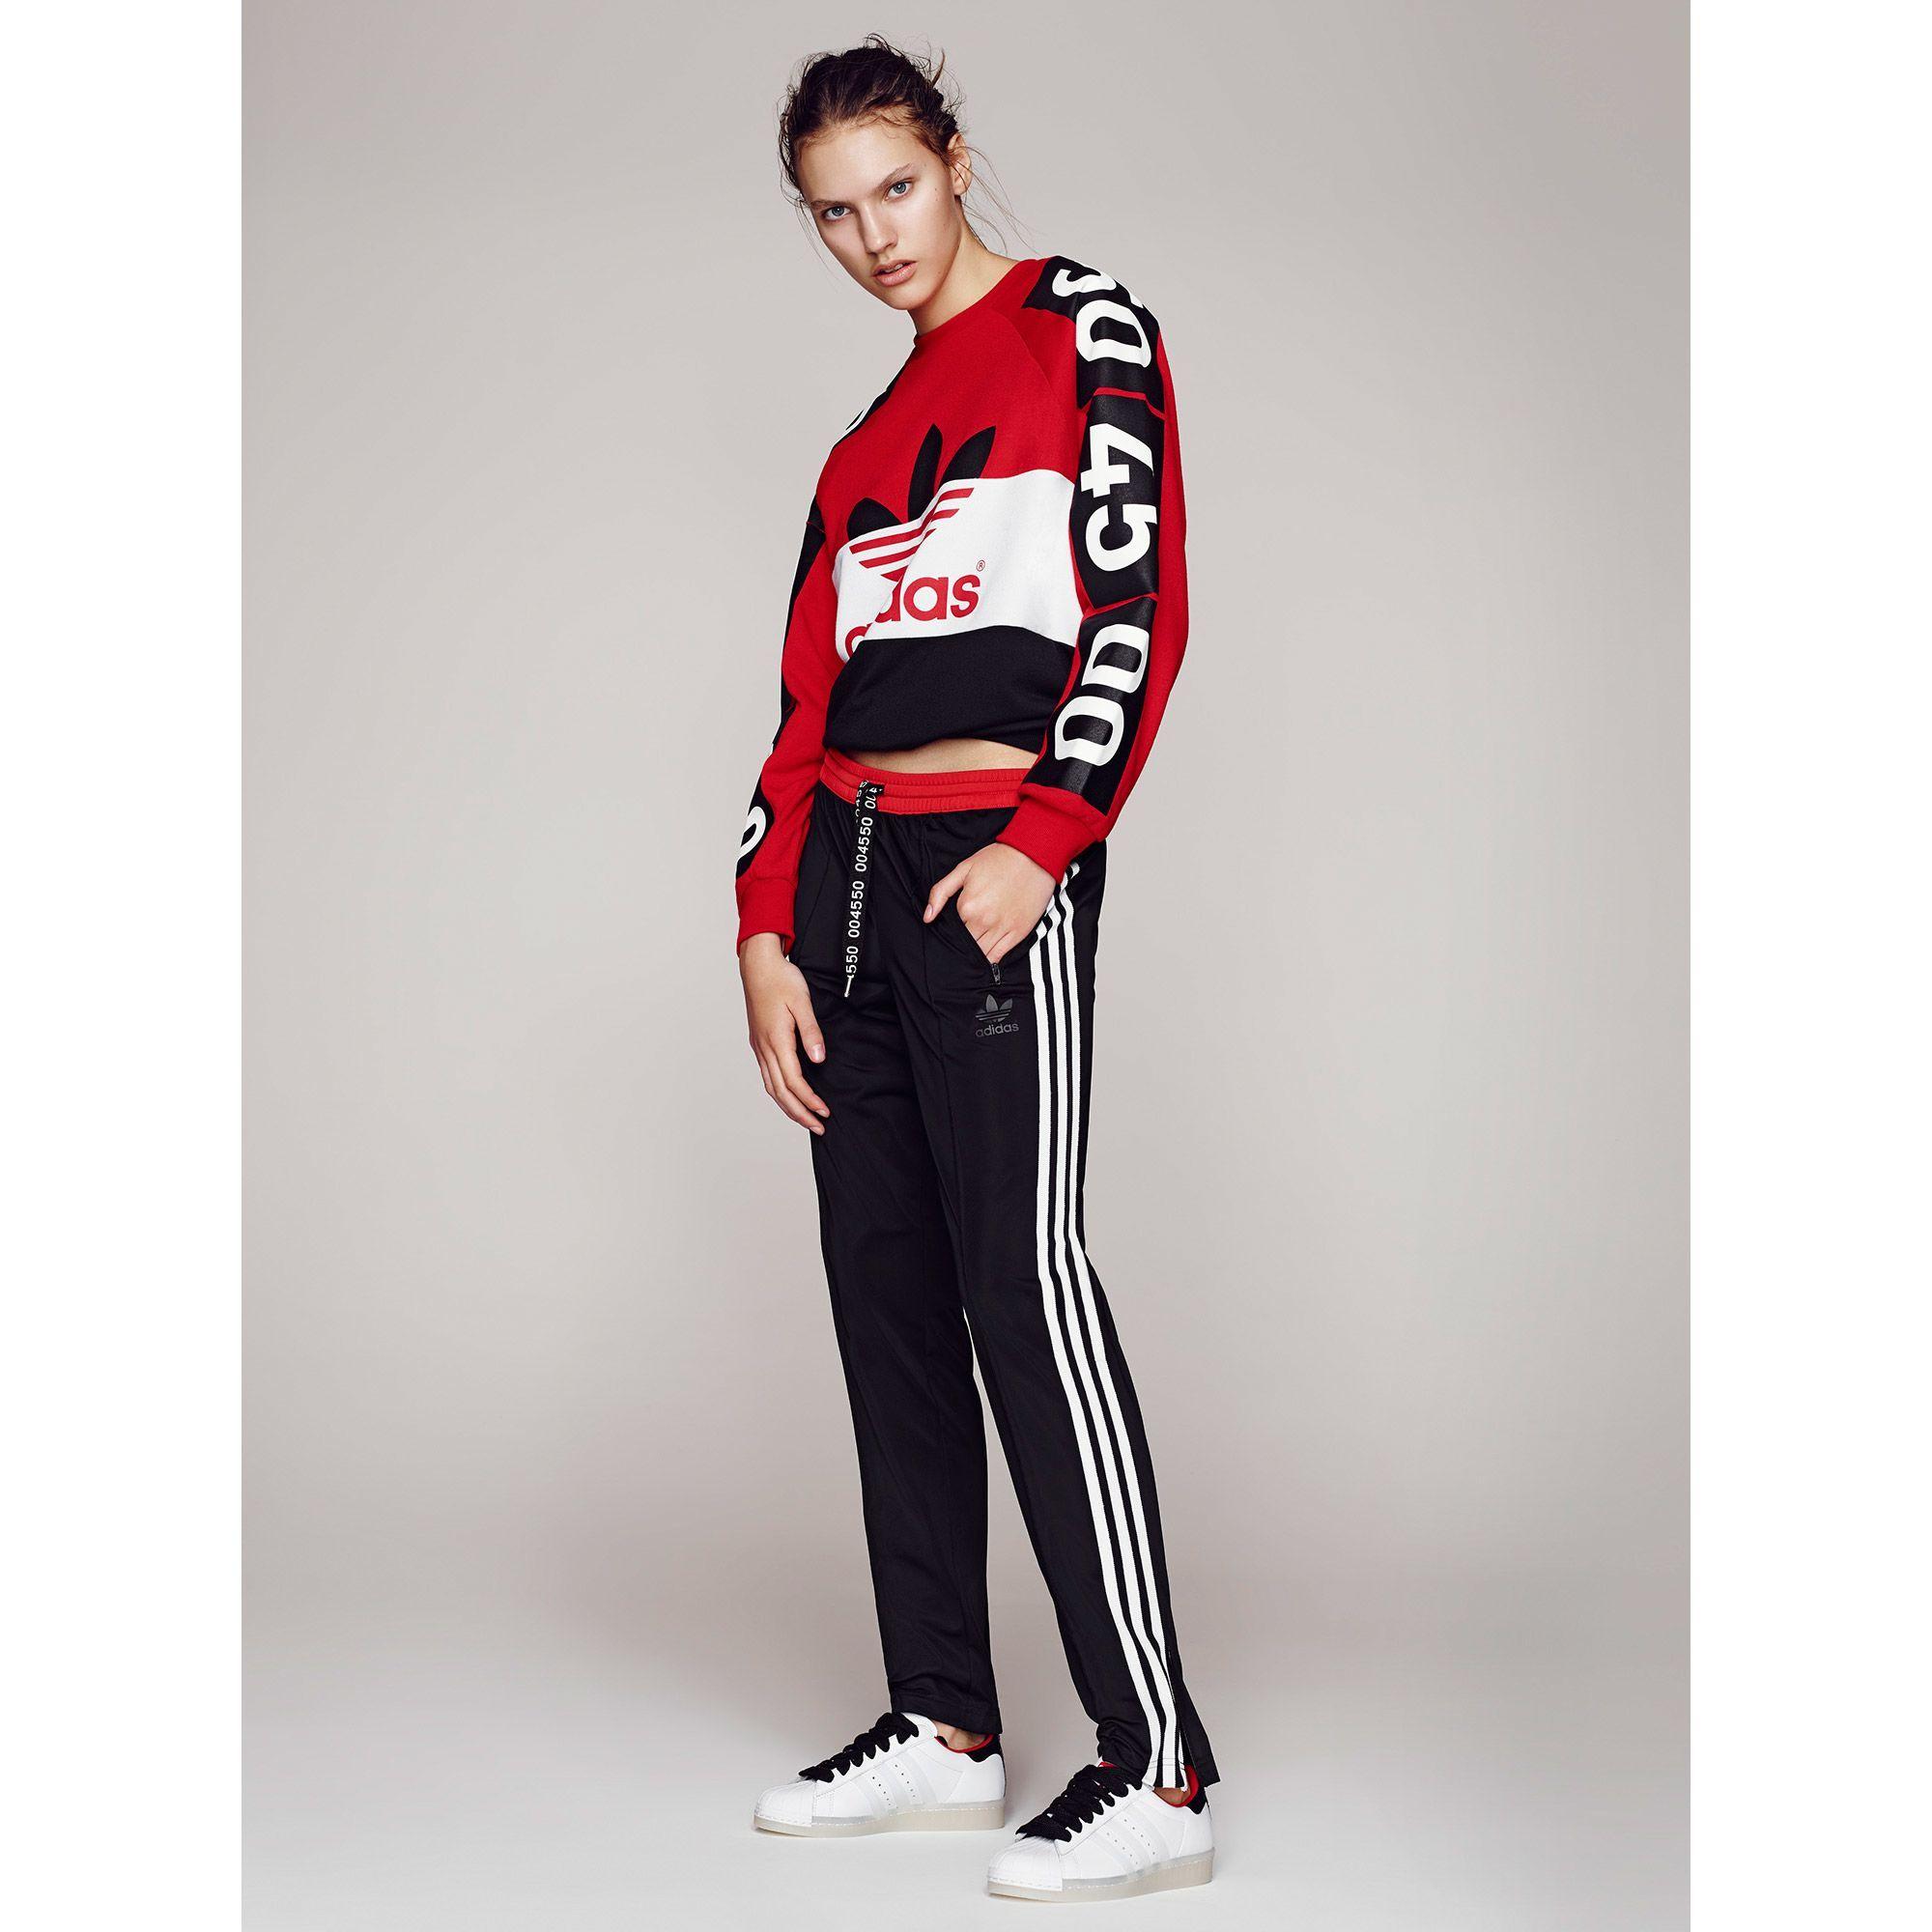 Sudadera ADIDAS Topshop desea Pinterest adidas superstar